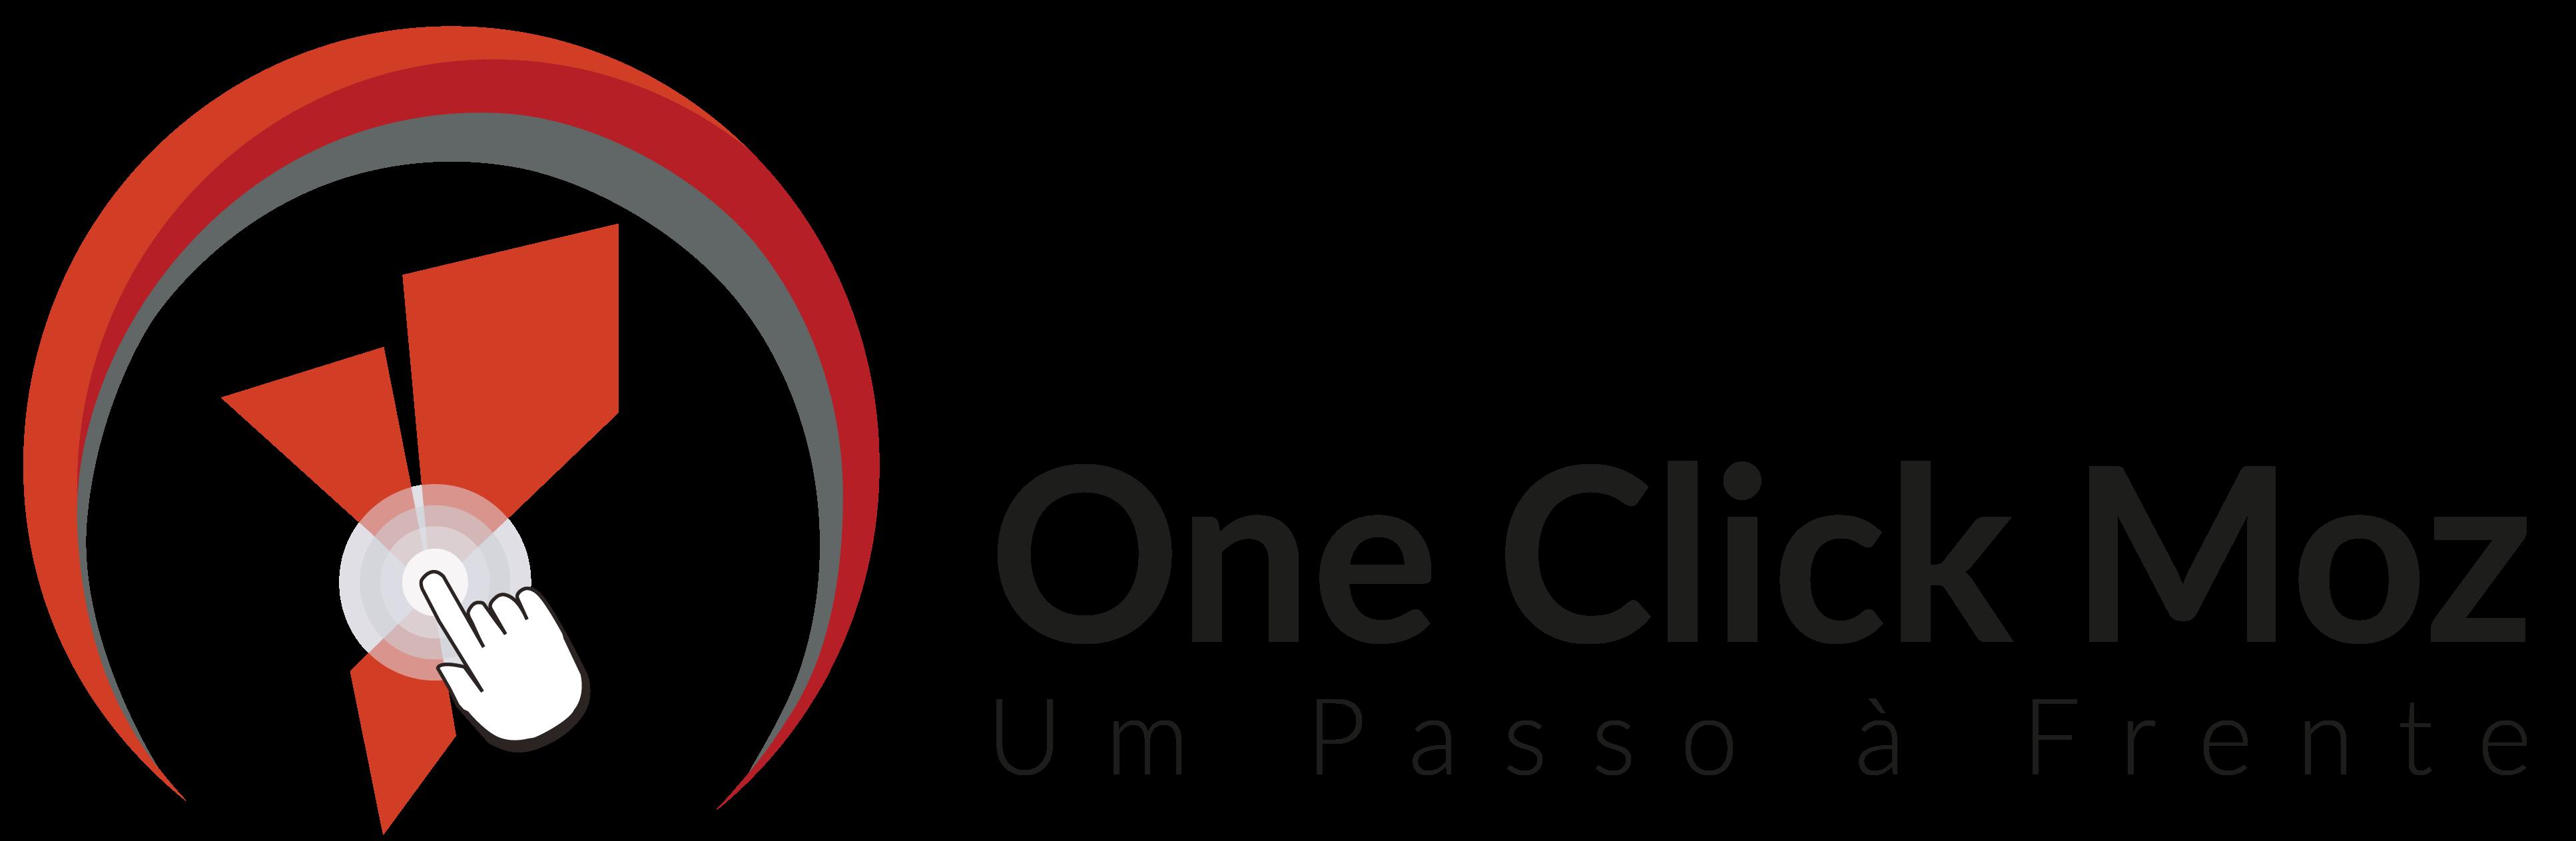 Logotipo One Click Mozambique, Estratégia de Marketing e Comunicação, One Click Mozambique, Full Service, Agência 360